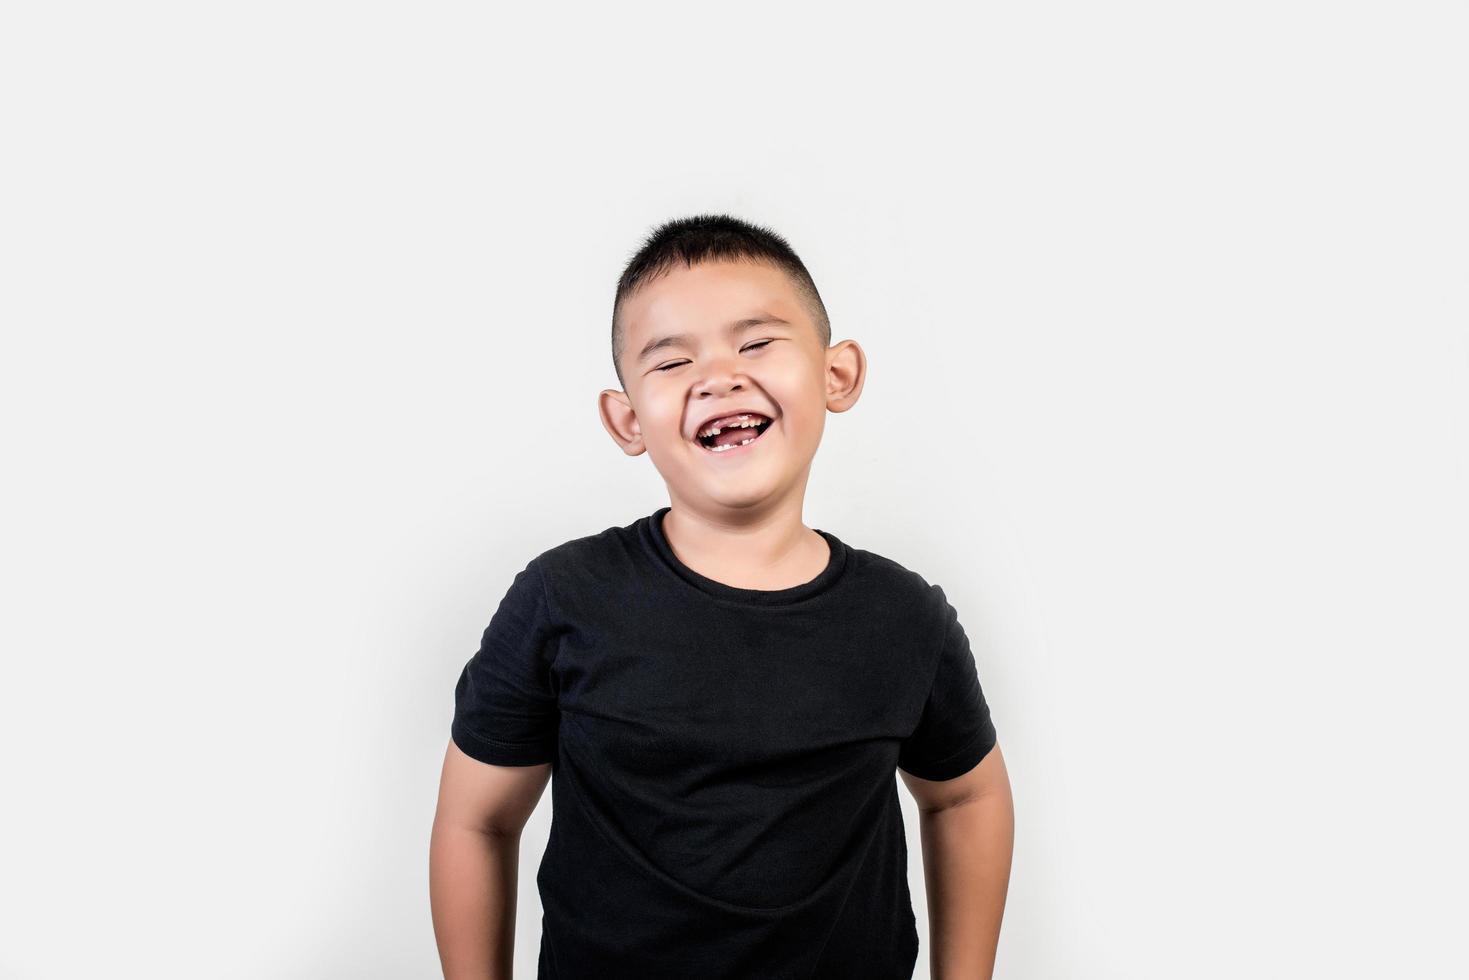 Funny portrait boy studio photo. photo